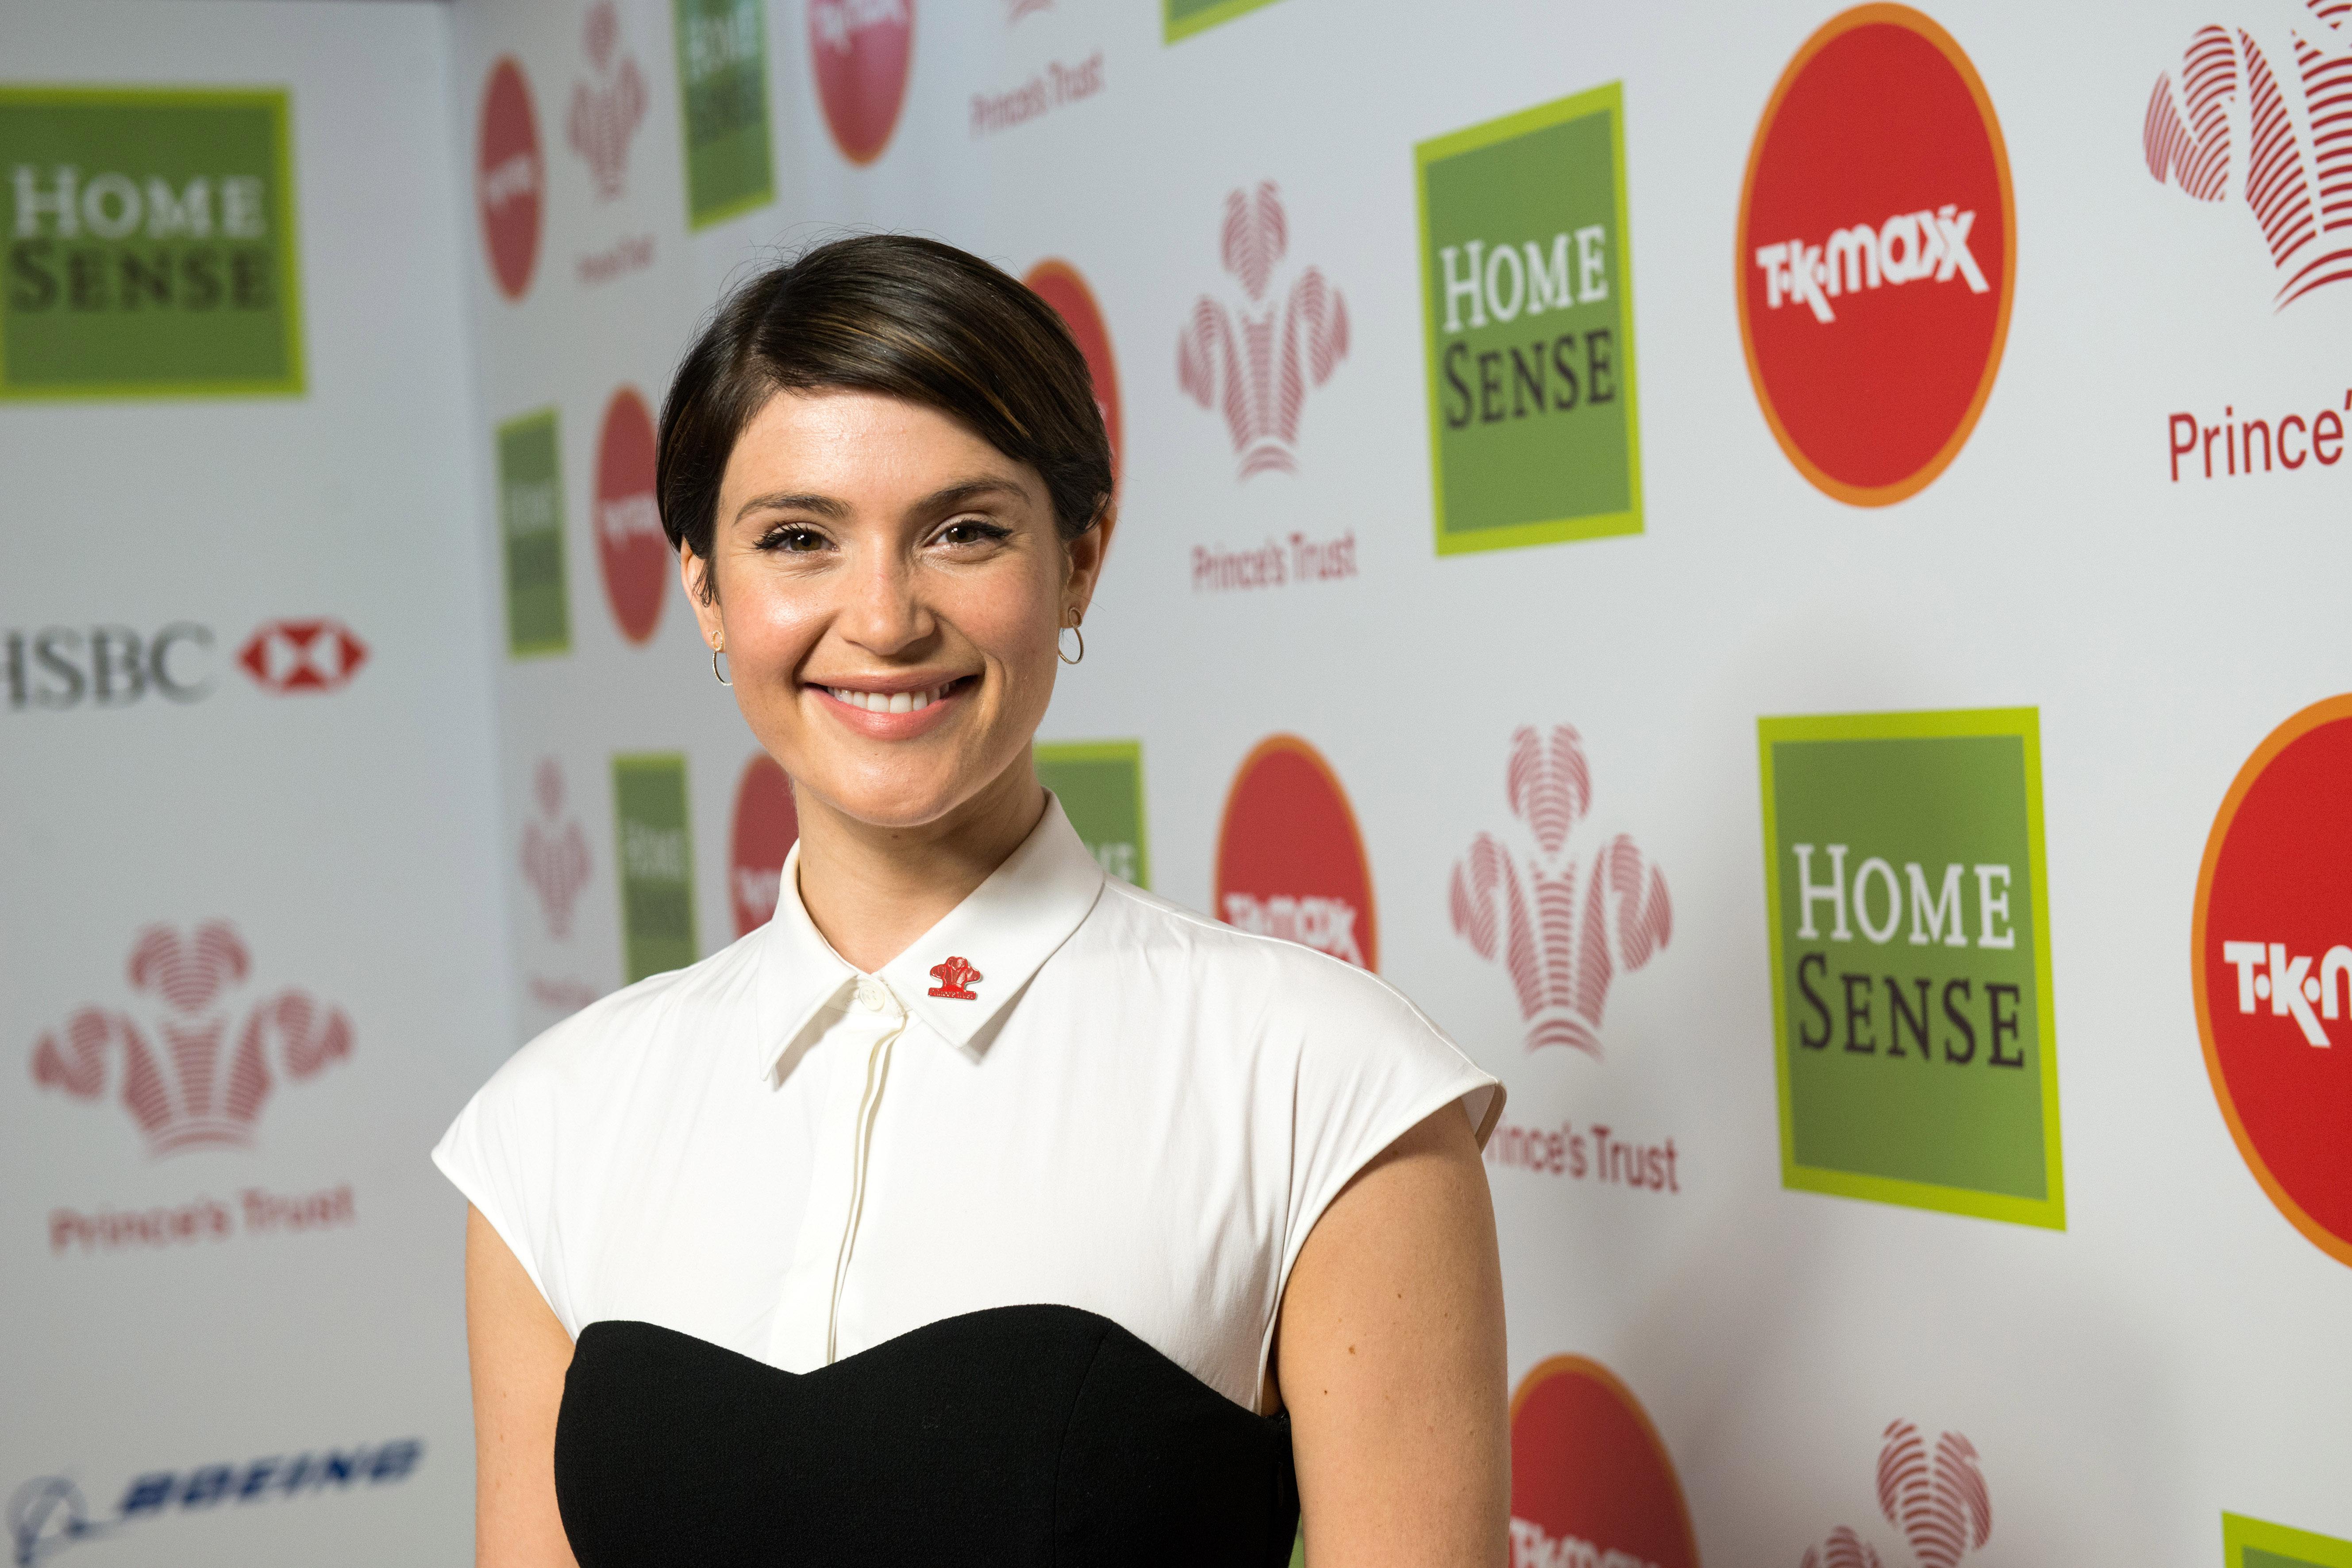 File:Gemma Arterton at The Prince's Trust Awards.jpg